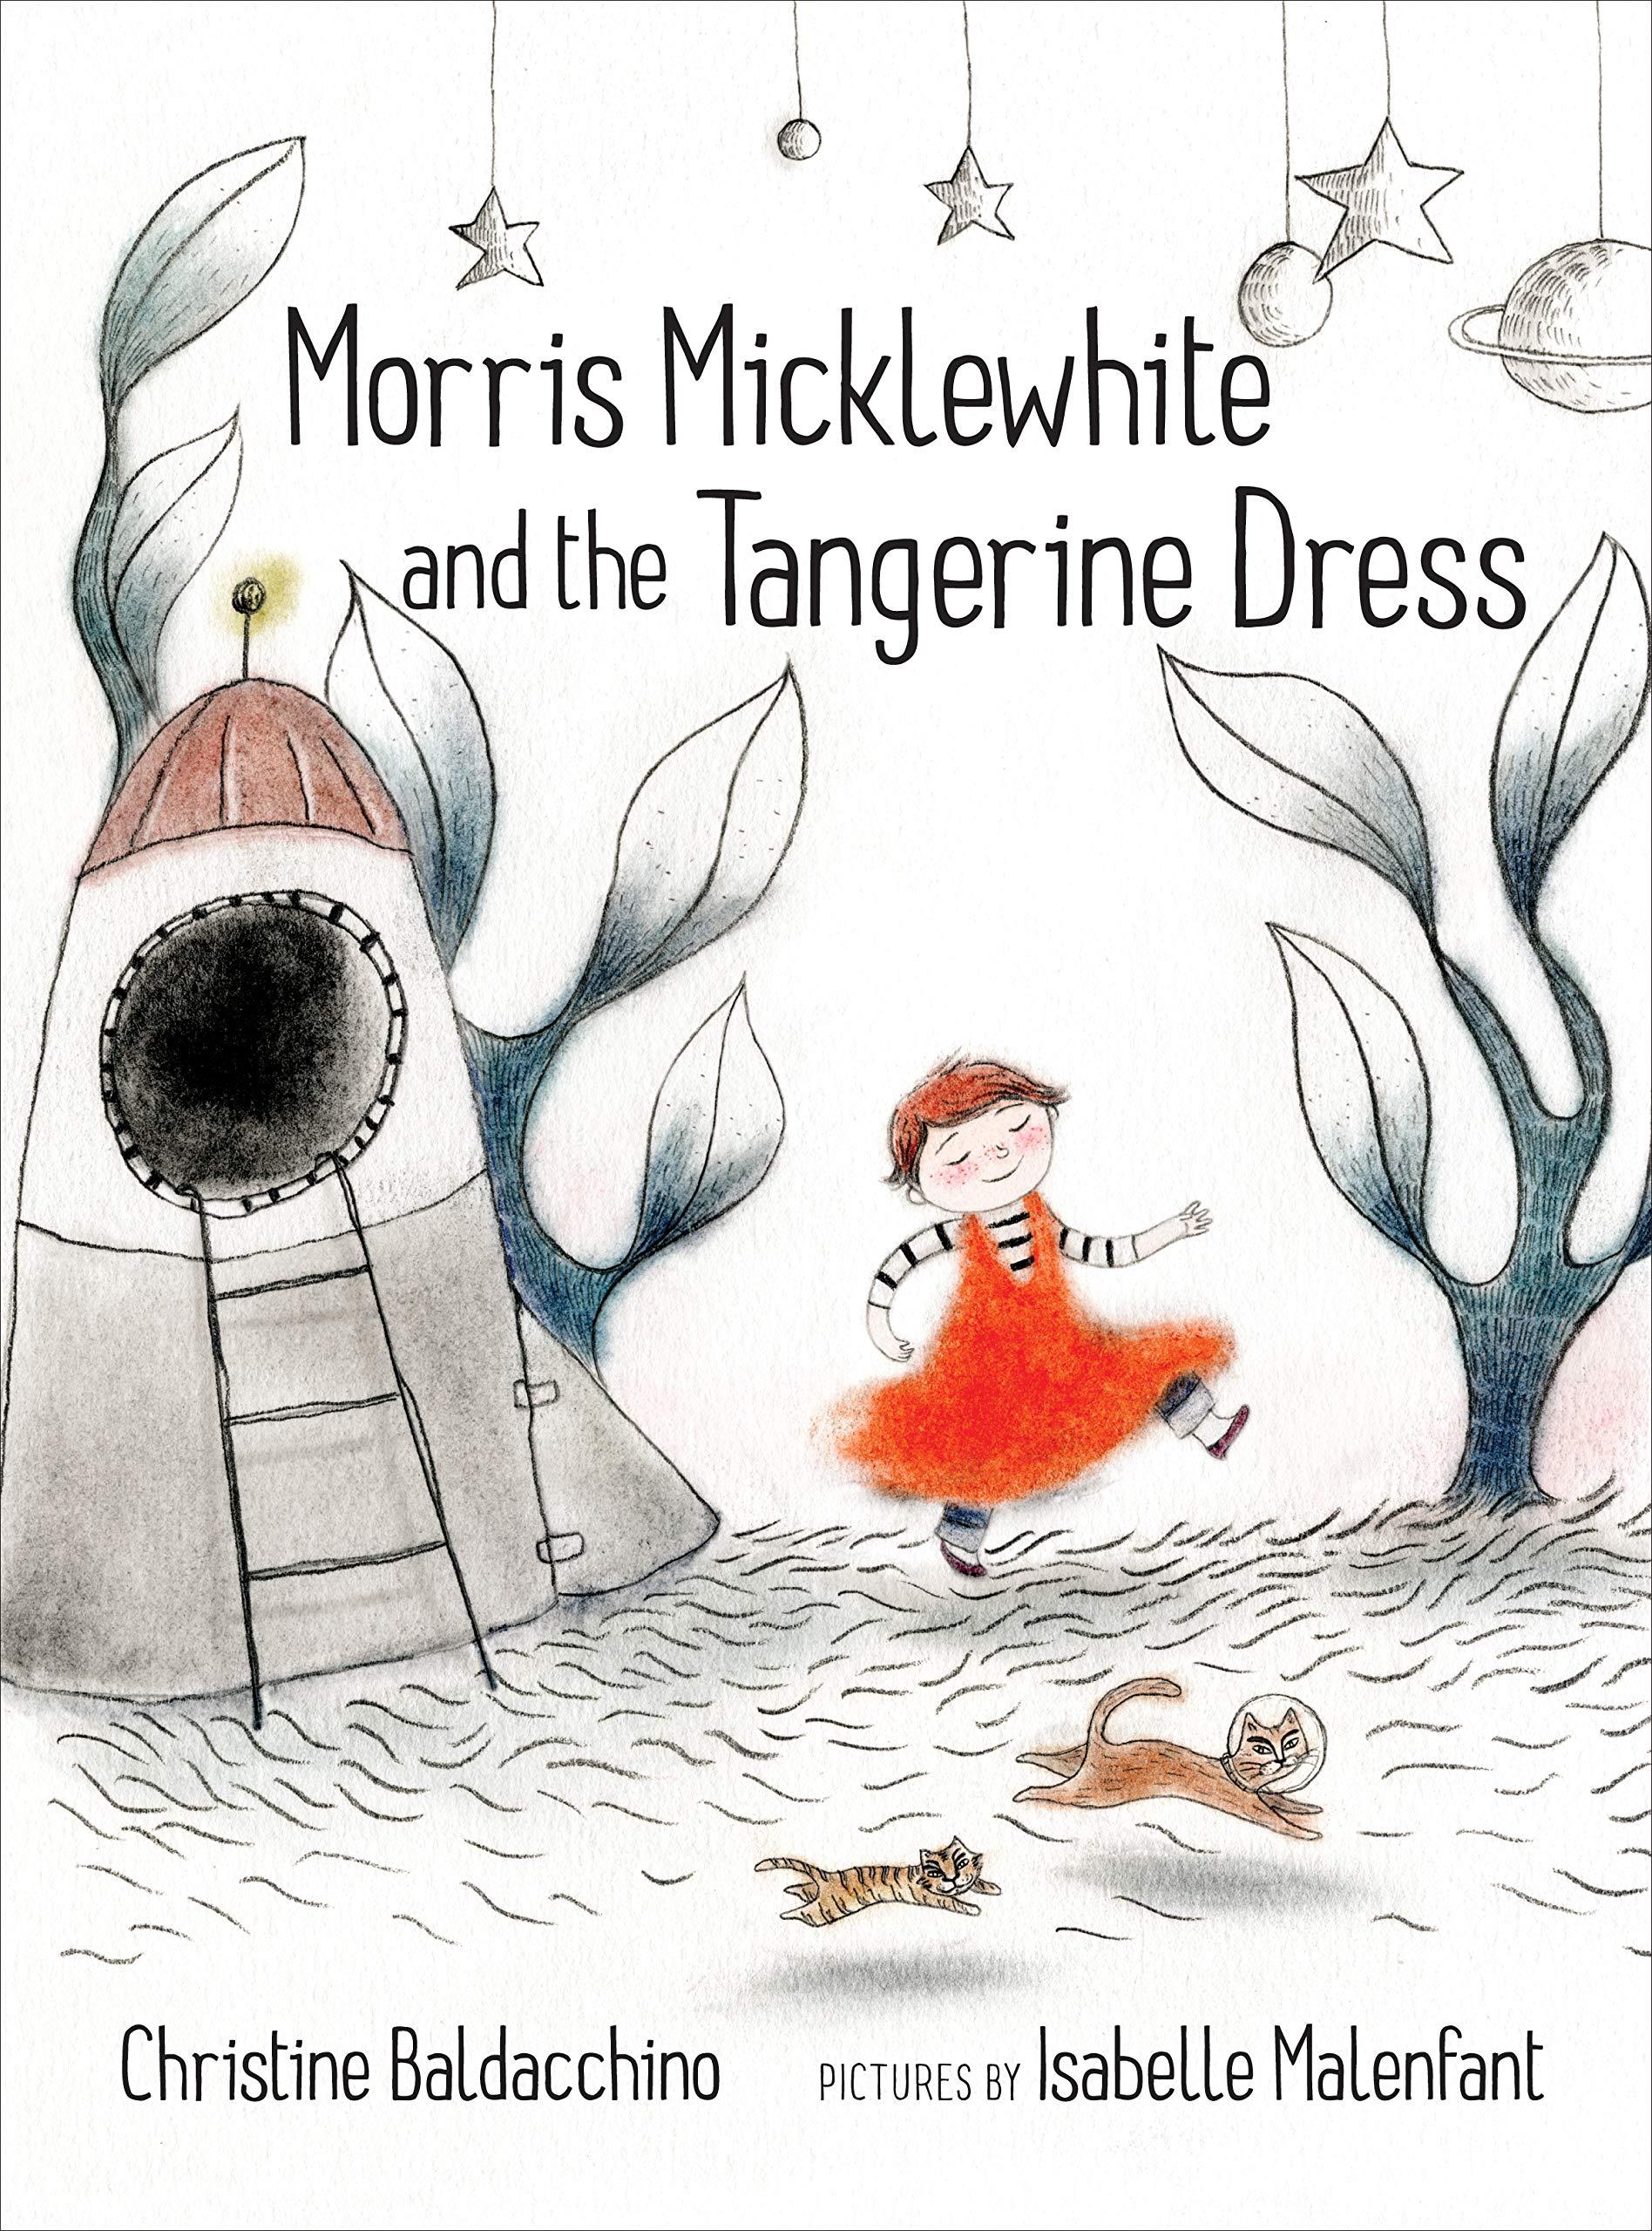 Morris Micklewhite and the Tangerine Dress: Baldacchino, Christine,  Malenfant, Isabelle: 9781554983476: Amazon.com: Books